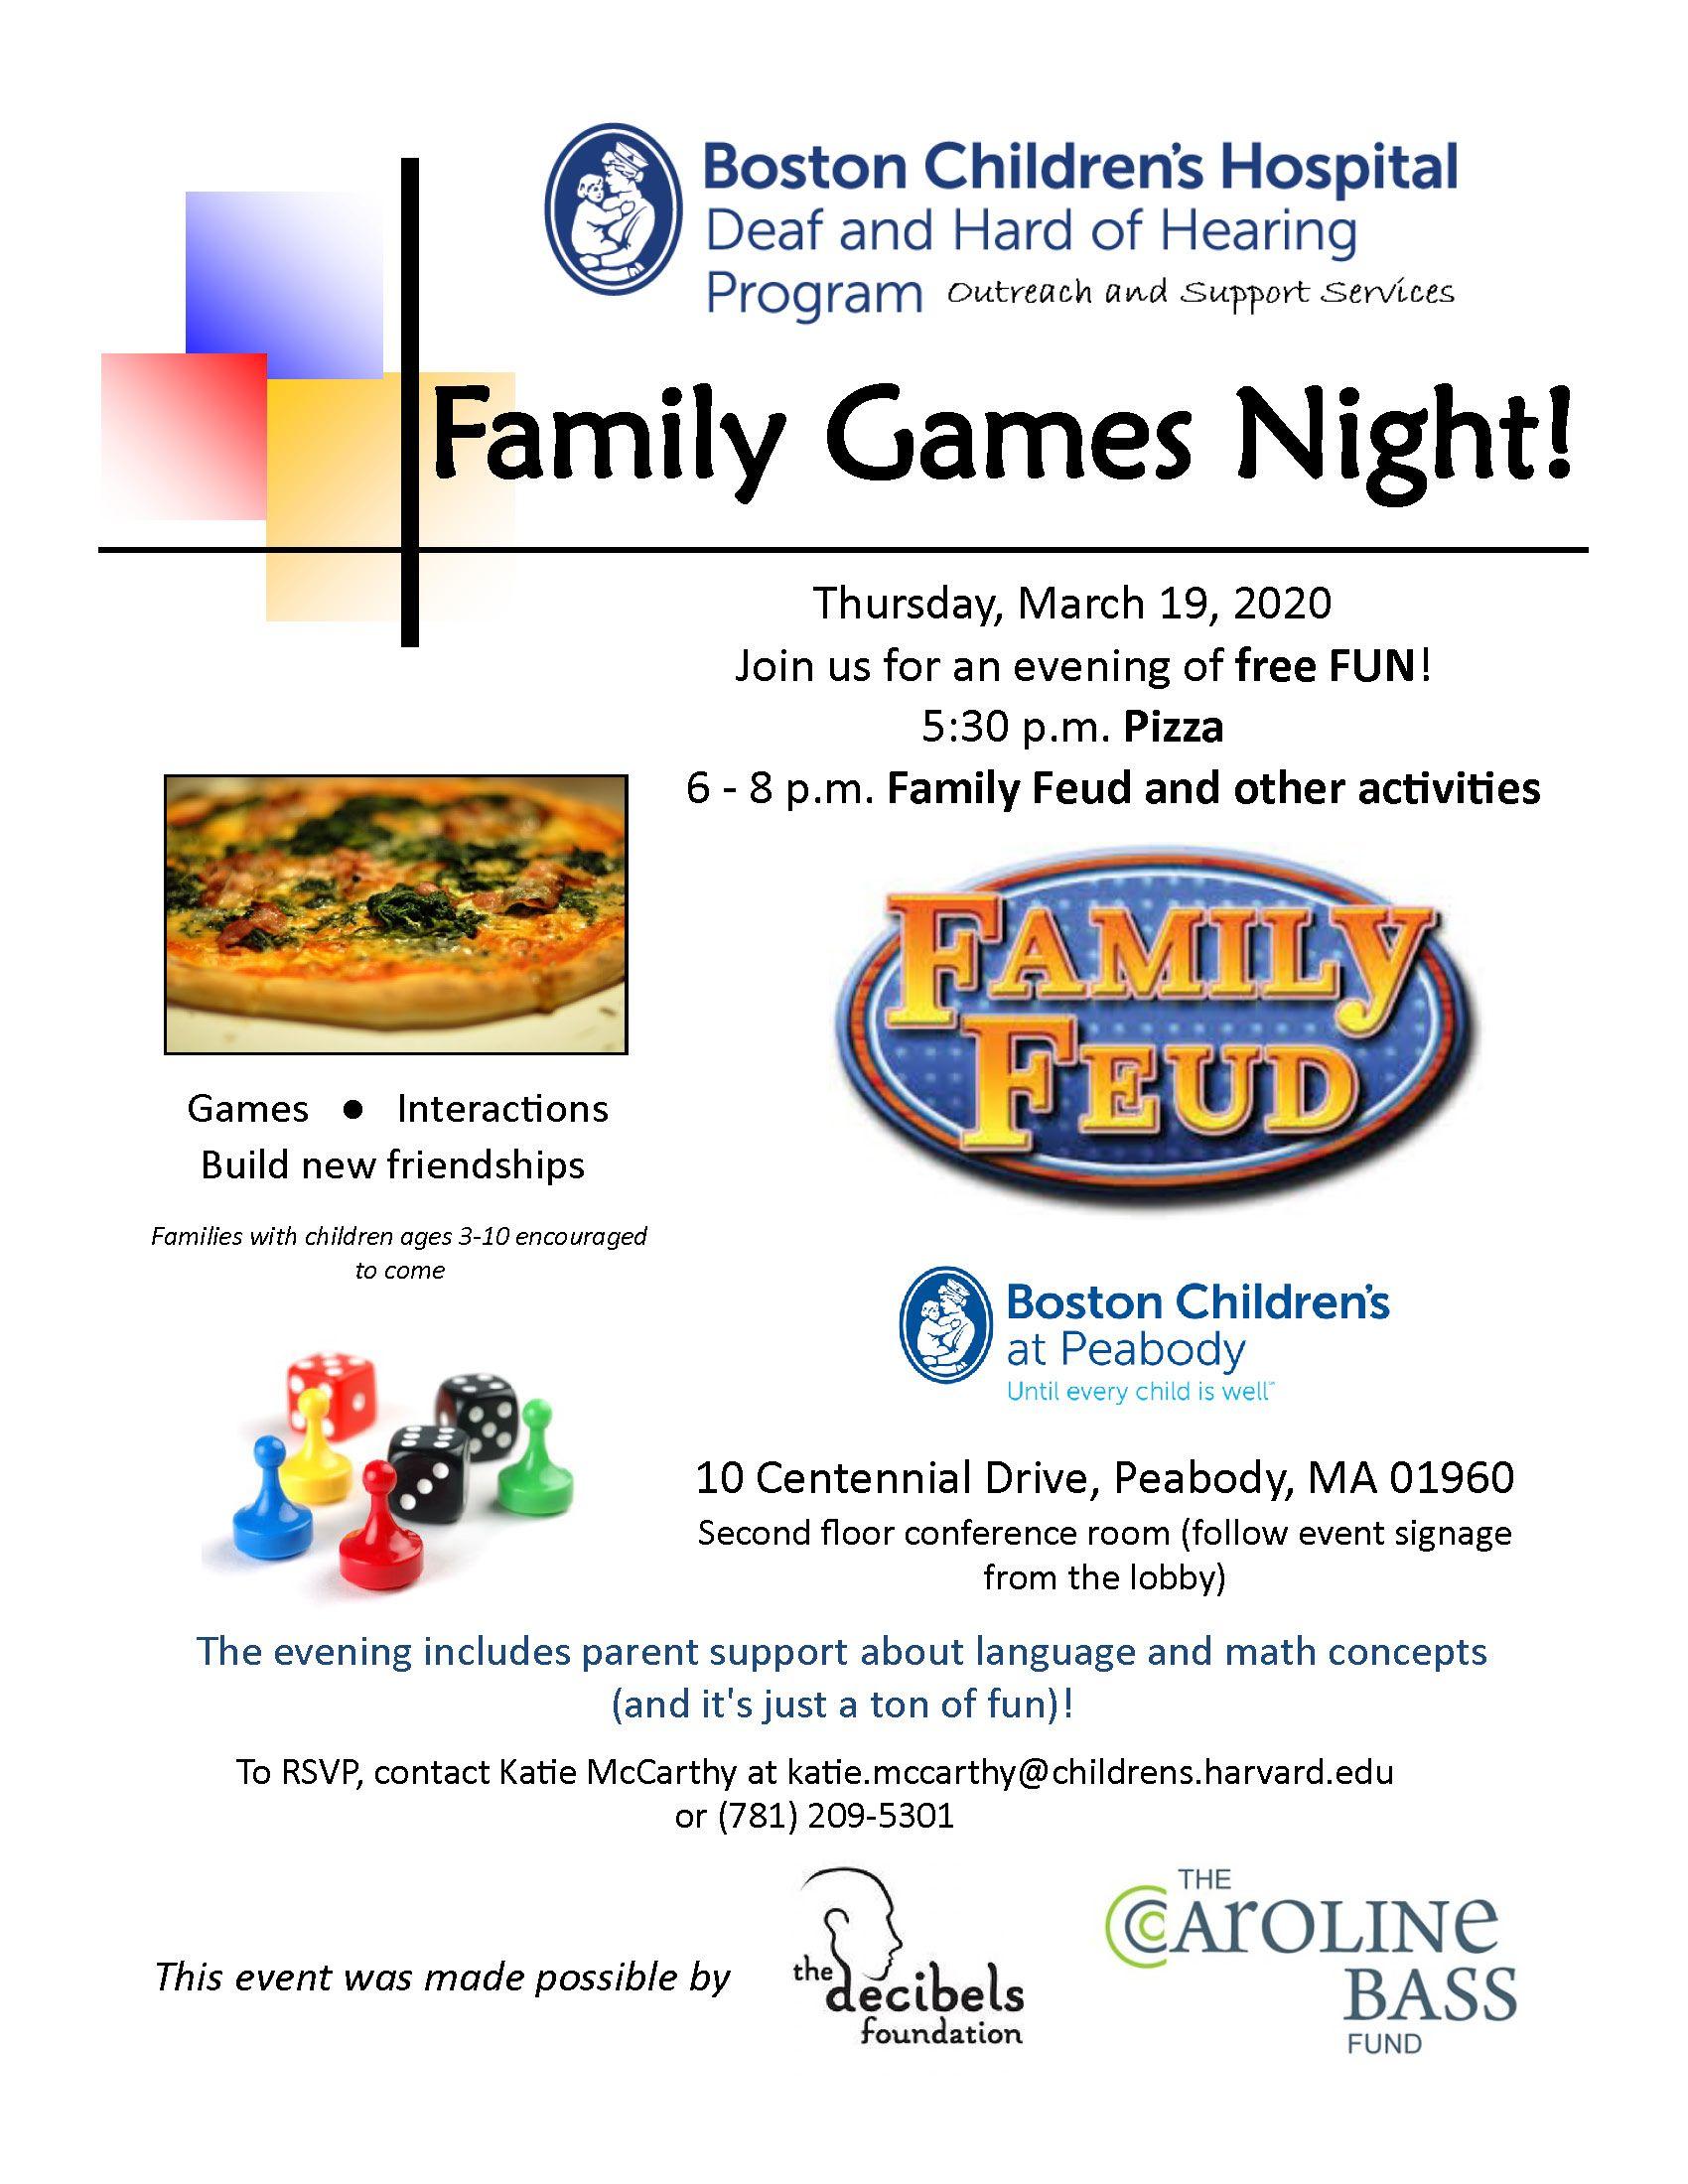 CANCELLED Family Games Night Peabody Boston Children's